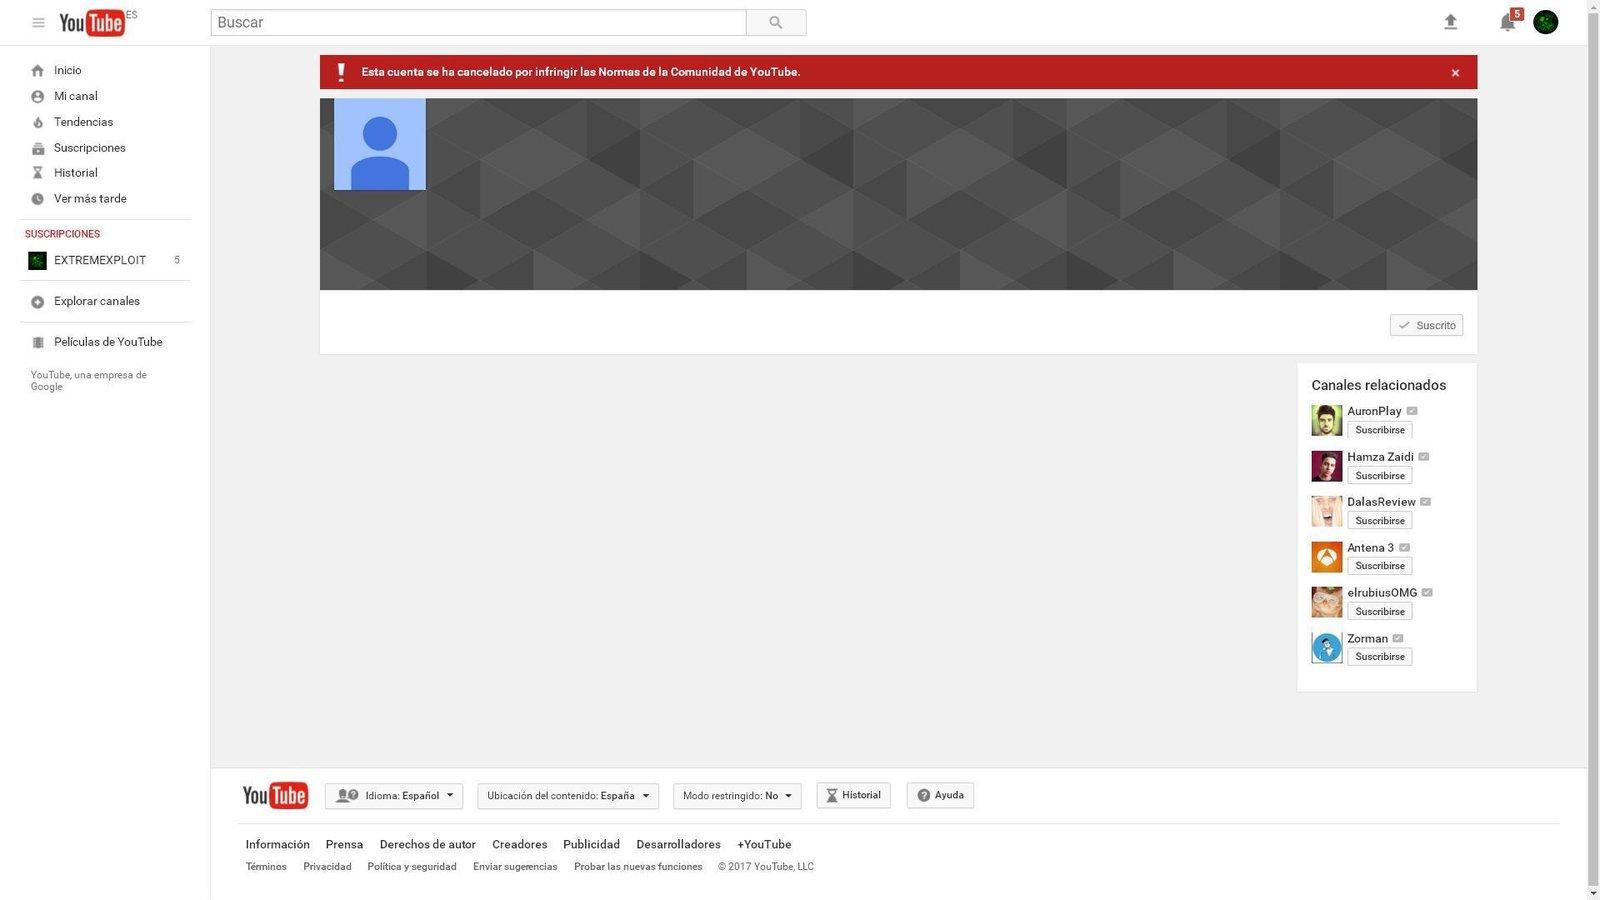 Peticion Google Restaurar El Canal De Youtube De Extremexploit Change Org